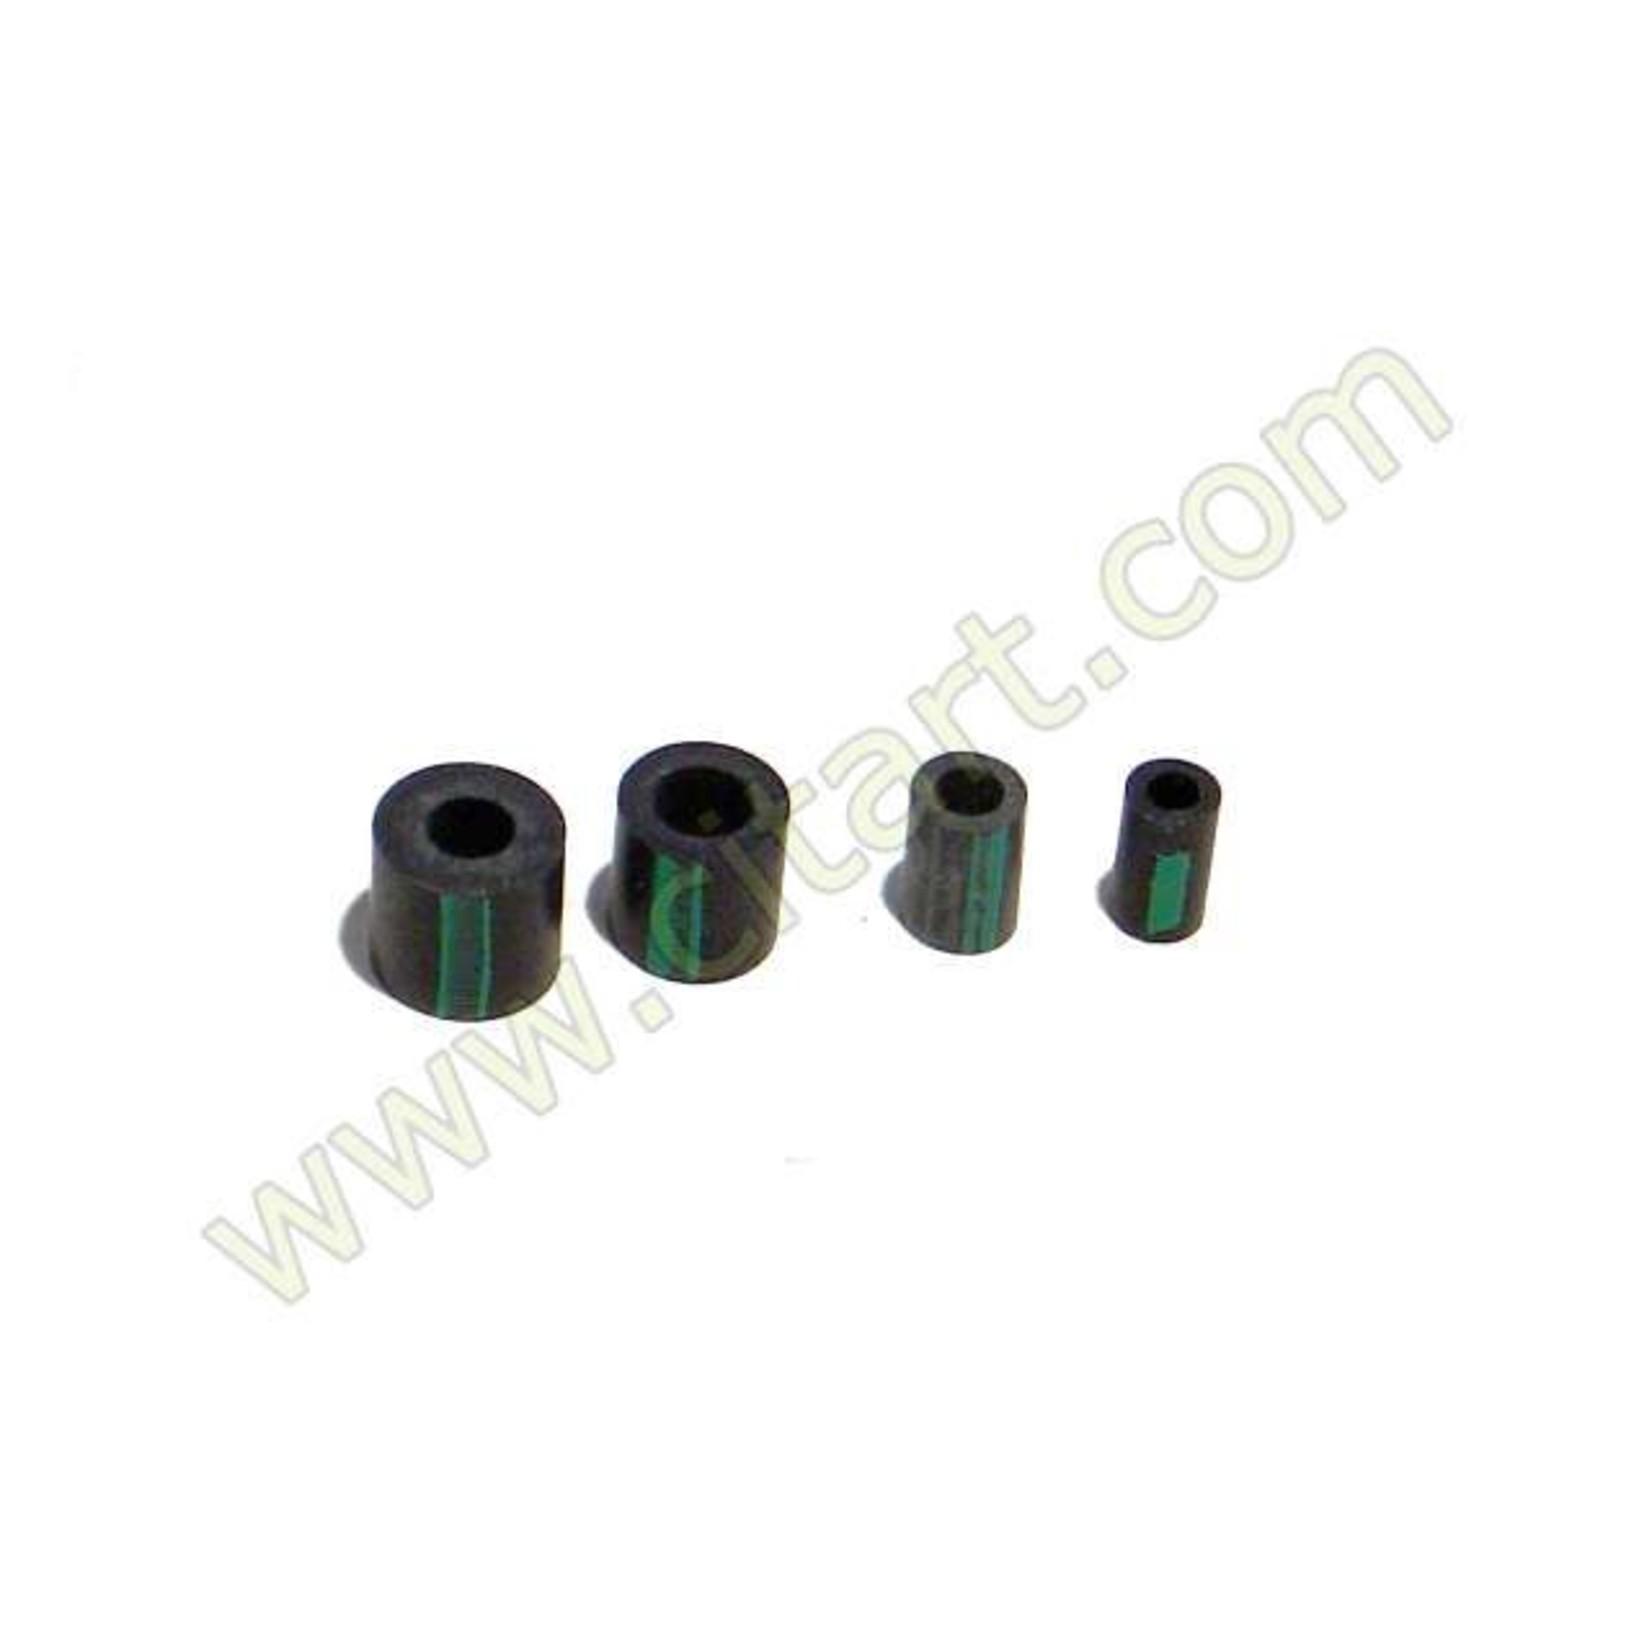 Leidingrubber LHM 3,5mm Nr Org: 96085785